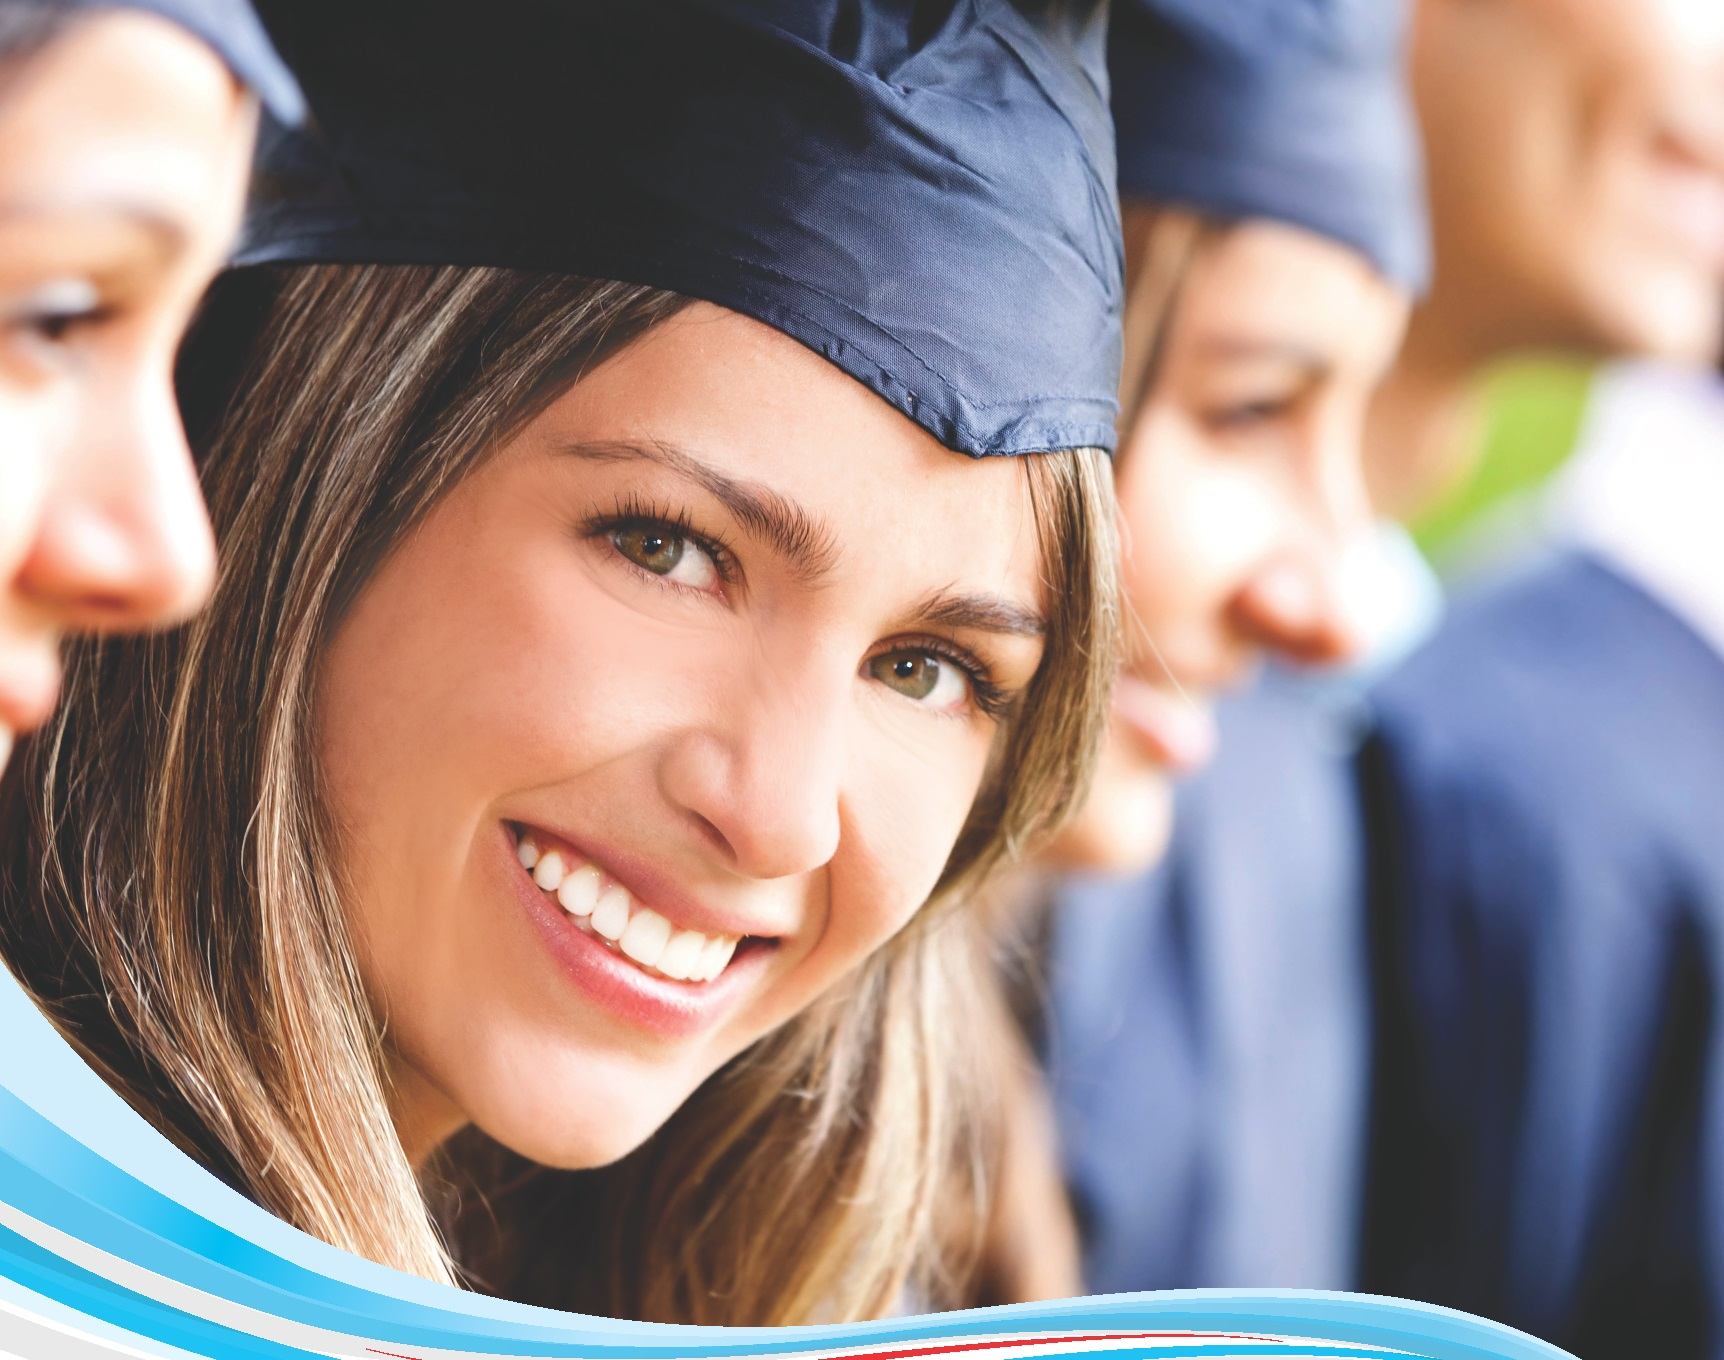 Graduacion-Ortodoncia-Expres-Murcia-Velez-Lozano